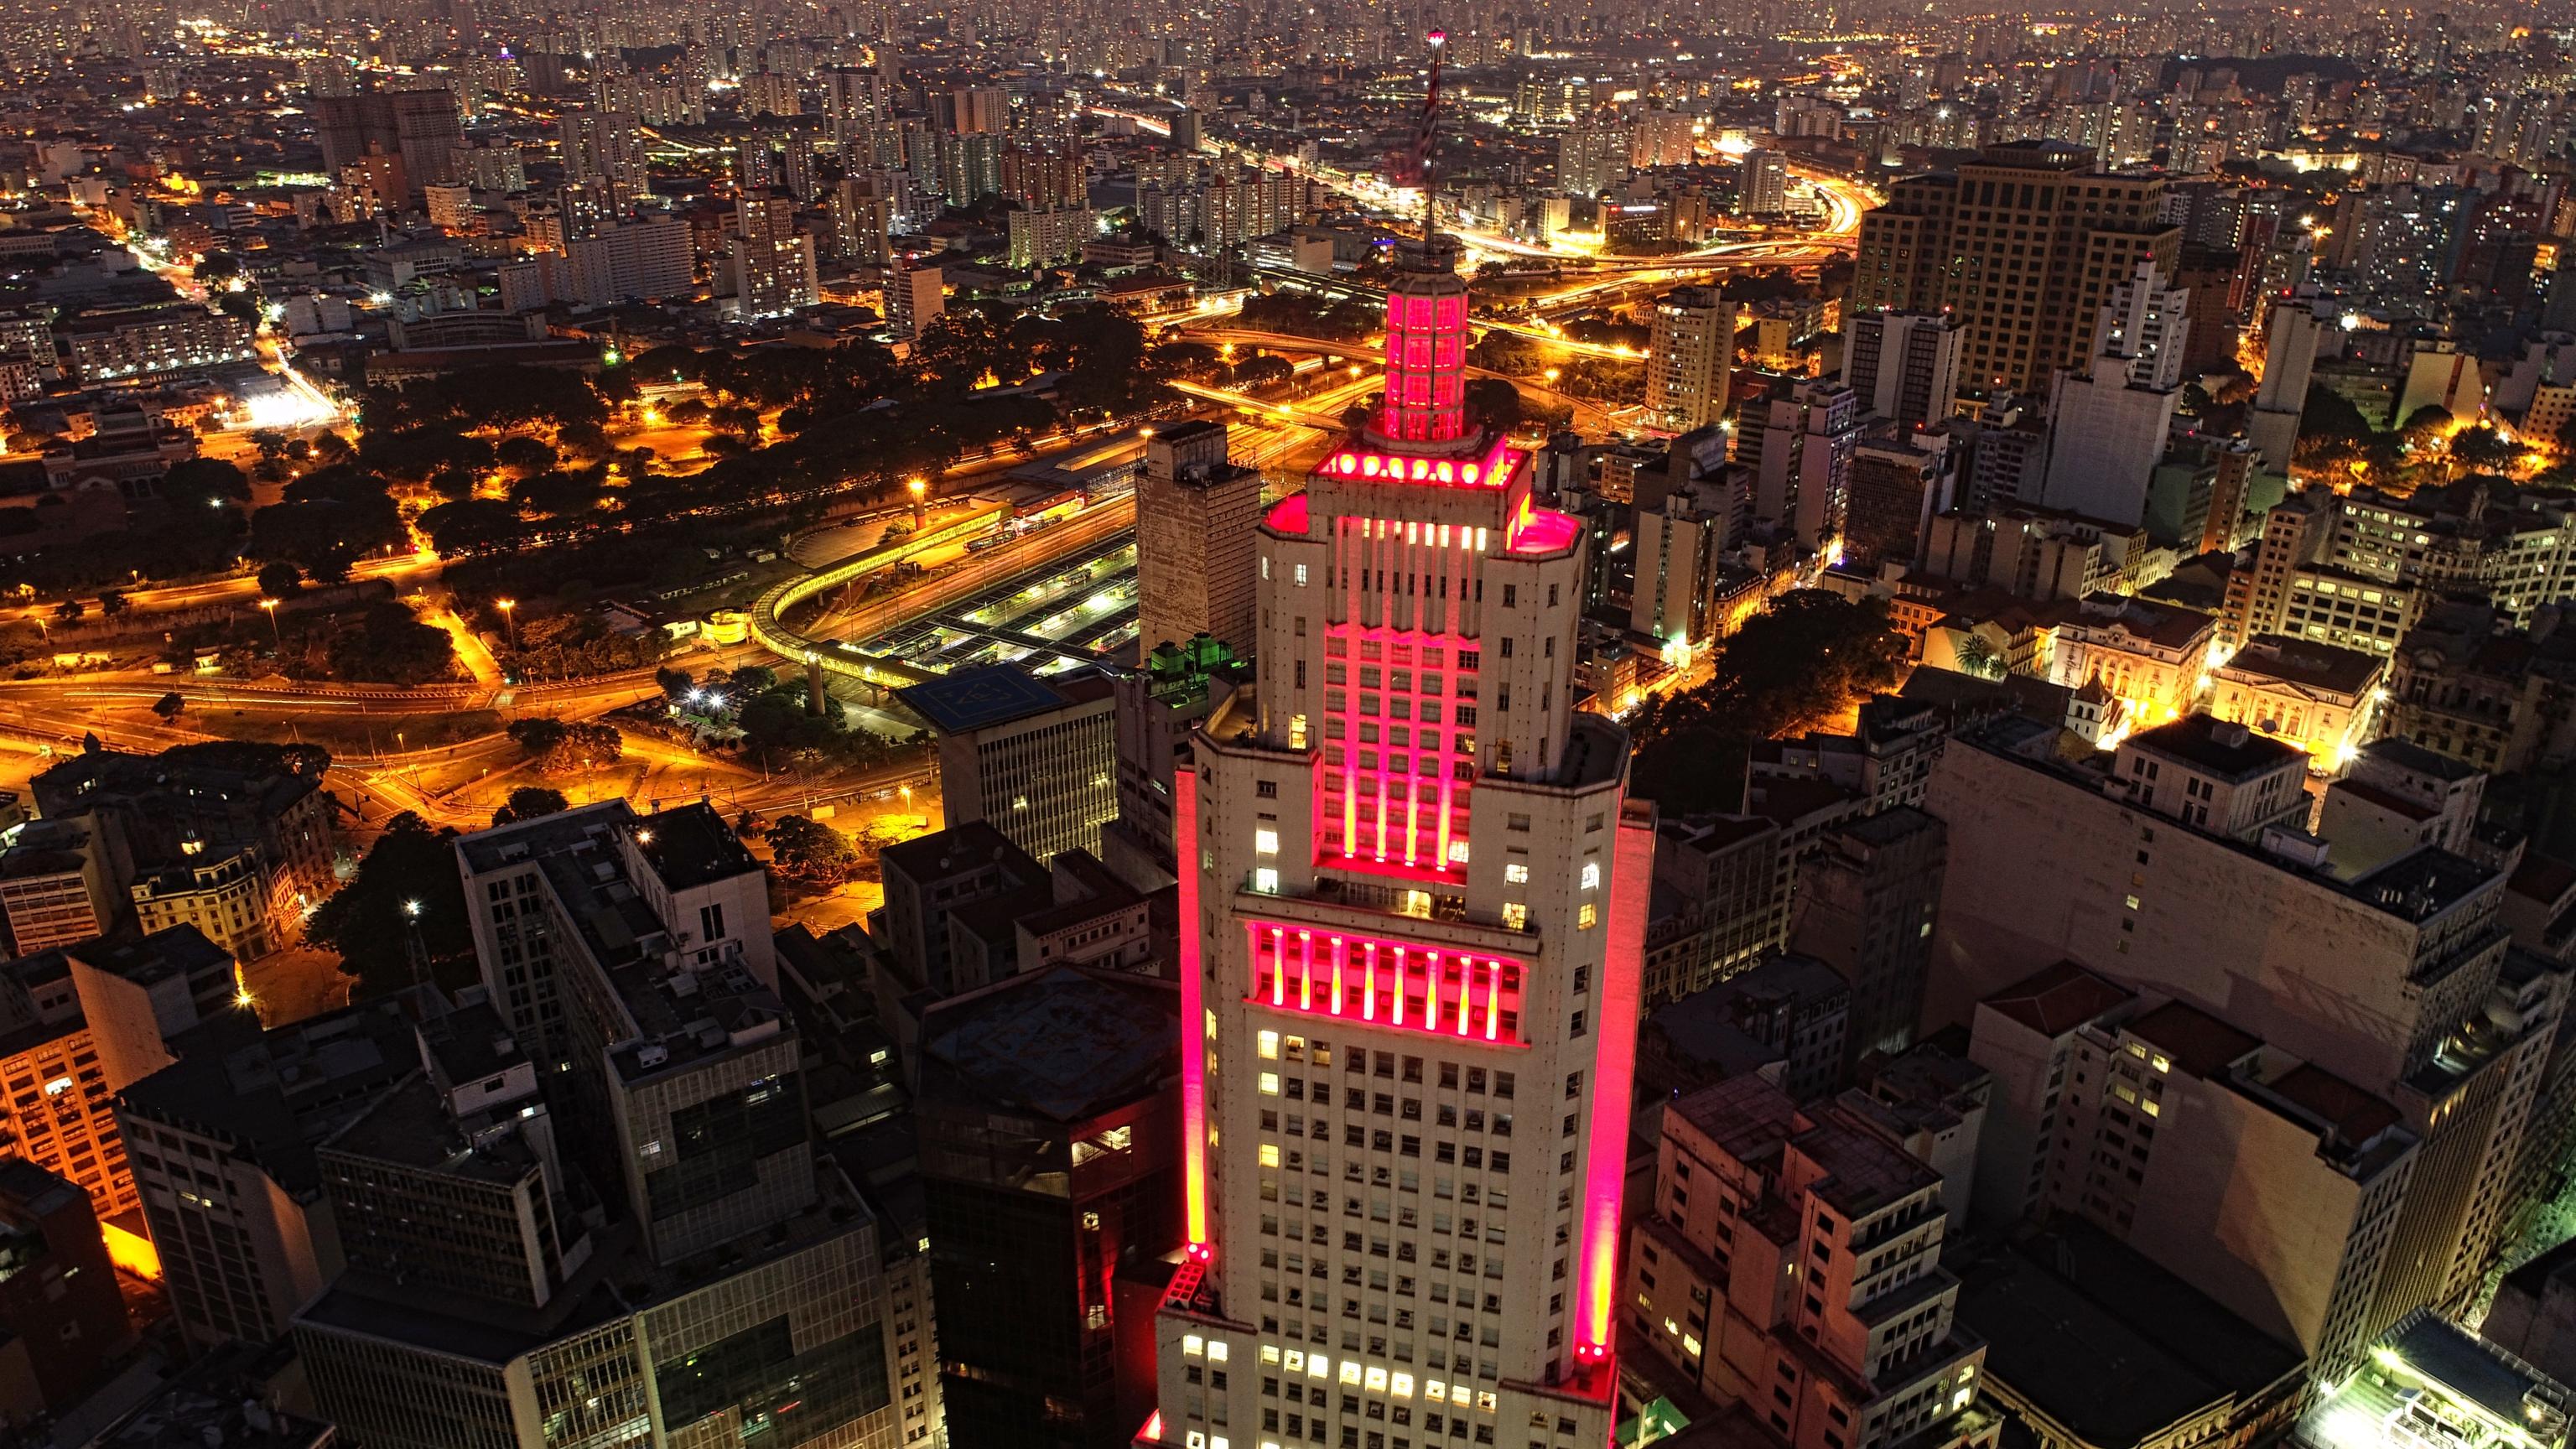 São Paulo São Paulo fonte: cdn.cnn.com